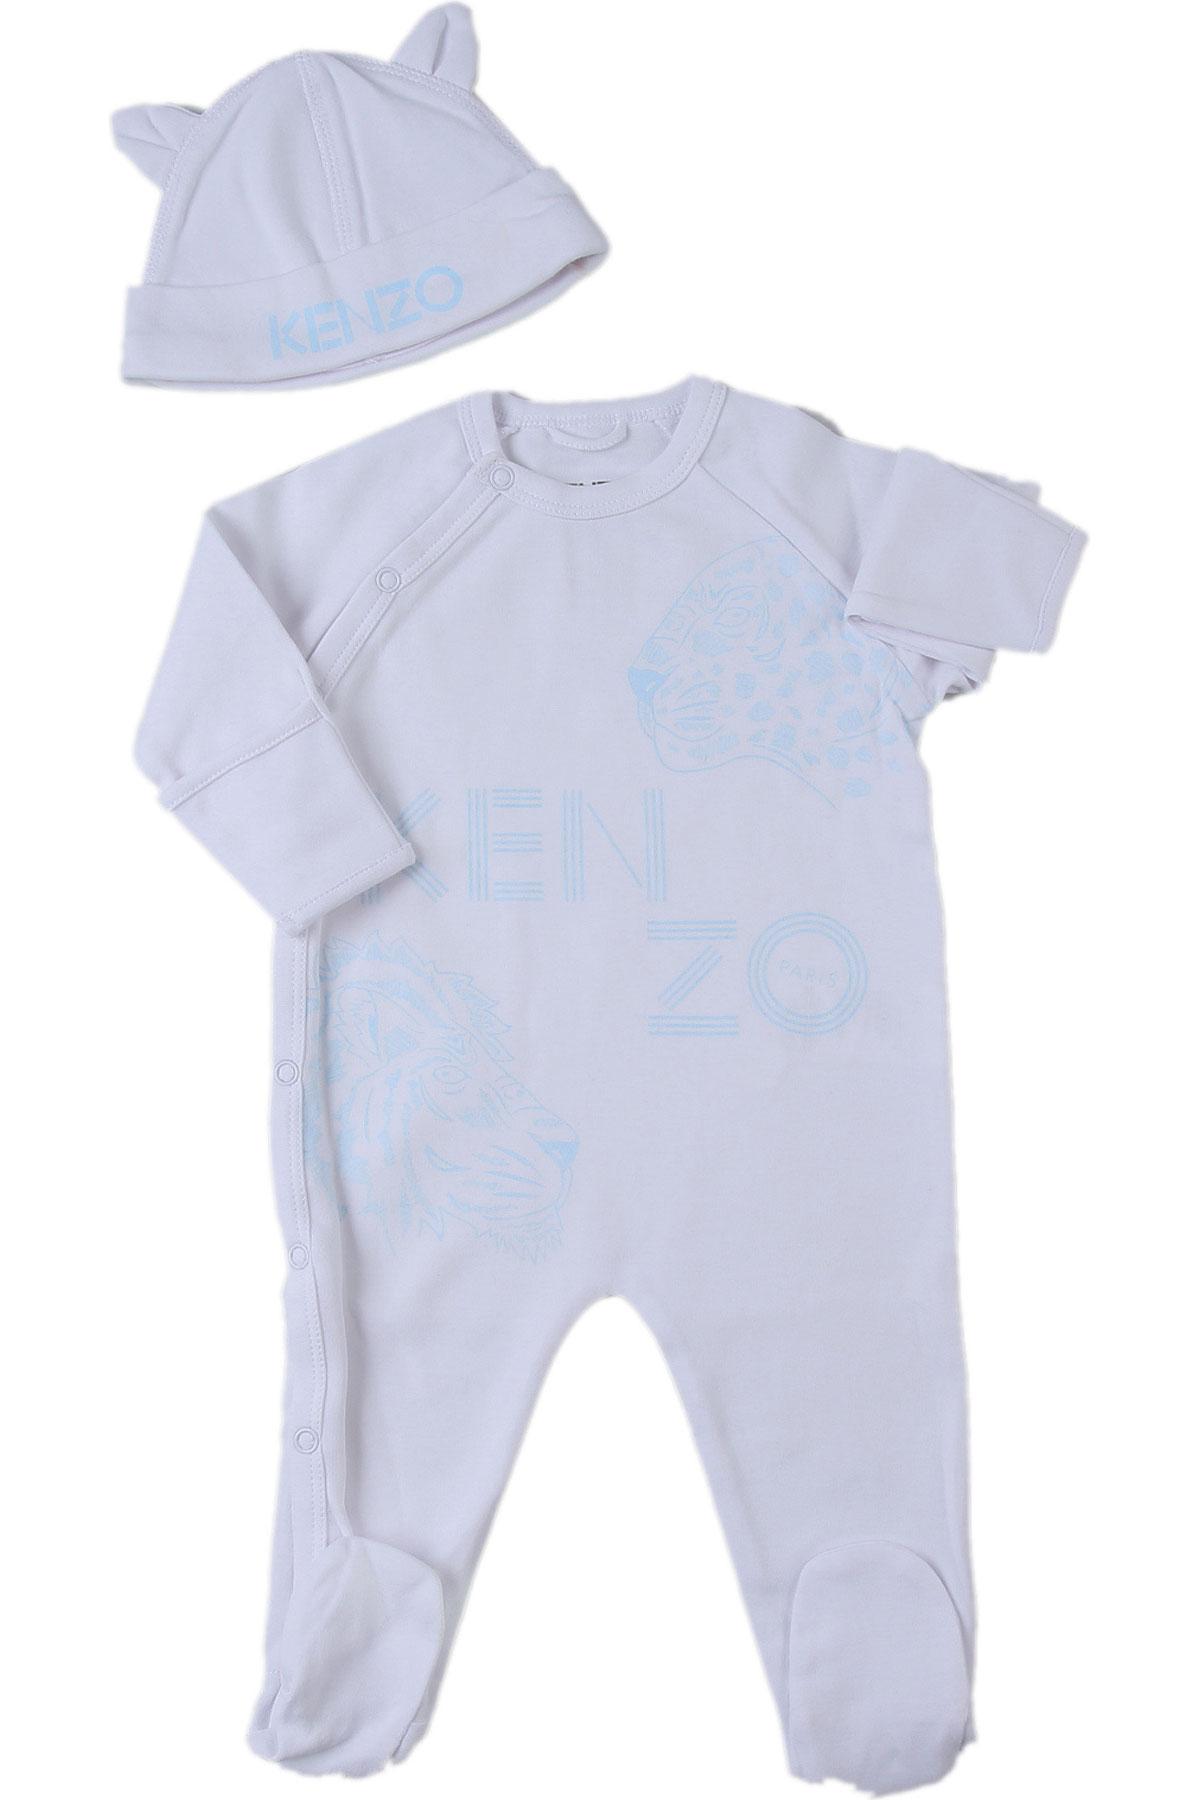 Kenzo Baby Bodysuits & Onesies for Boys On Sale, White, Cotton, 2019, 1M 3M